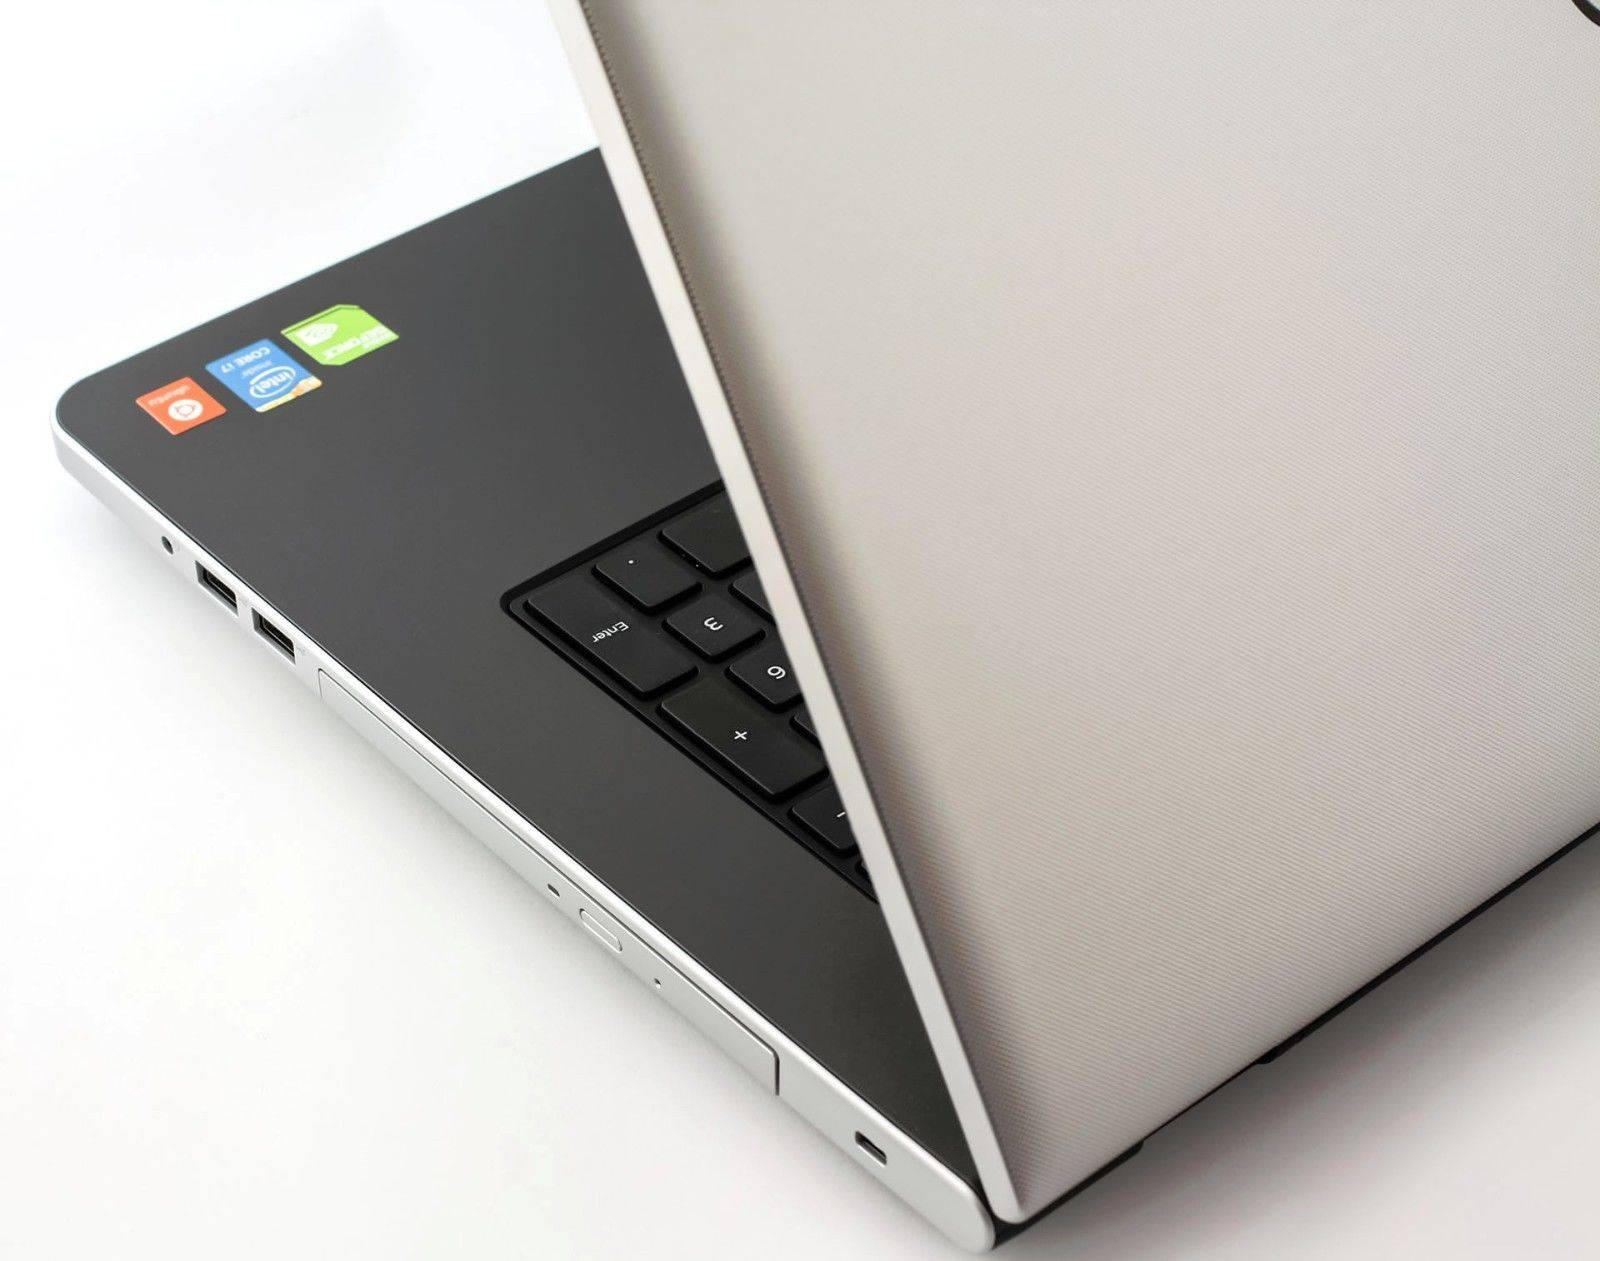 Dell Inspiron 5758 Laptop